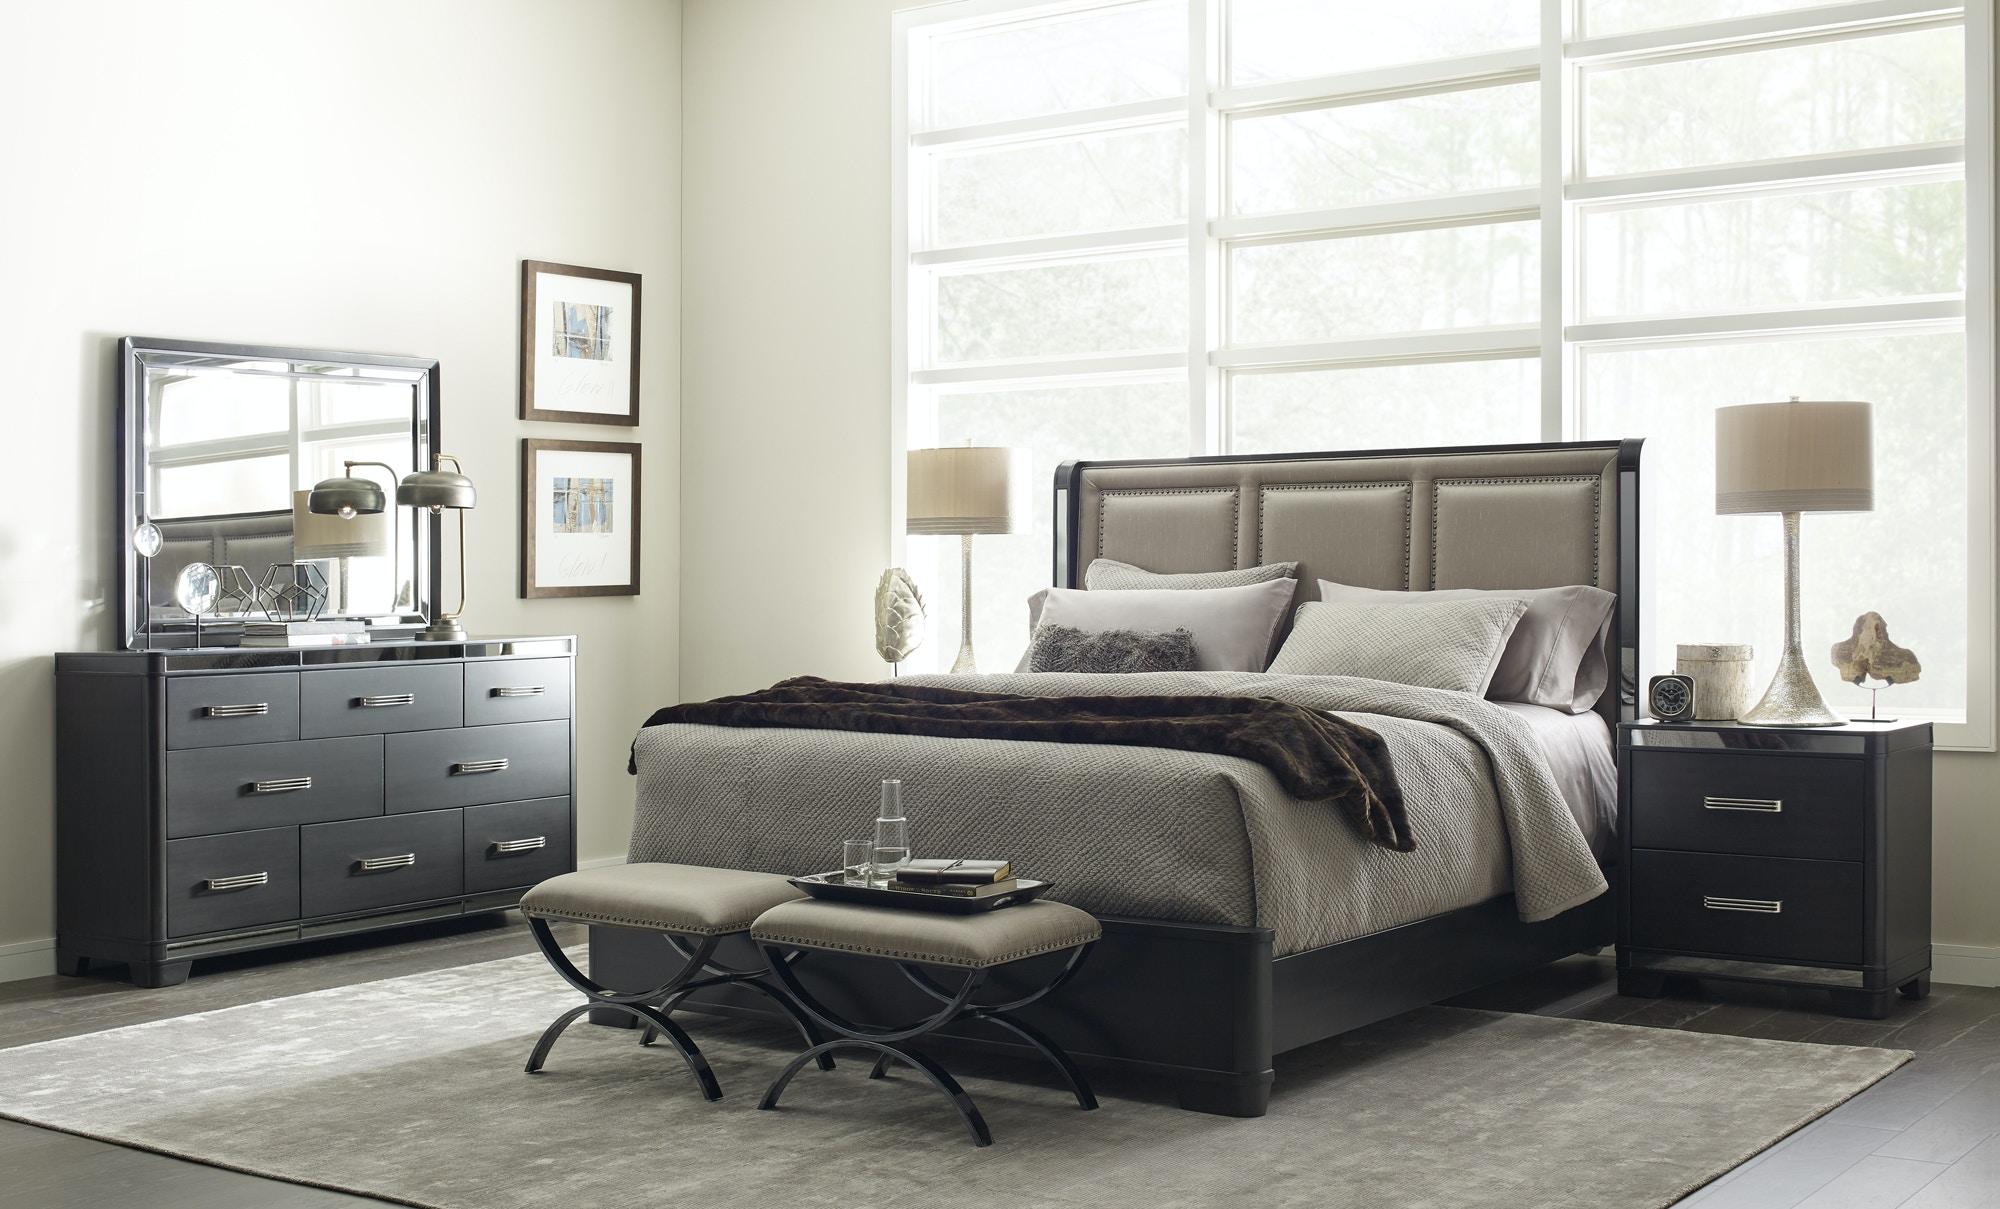 pulaski furniture silverton sound bedroom group queen